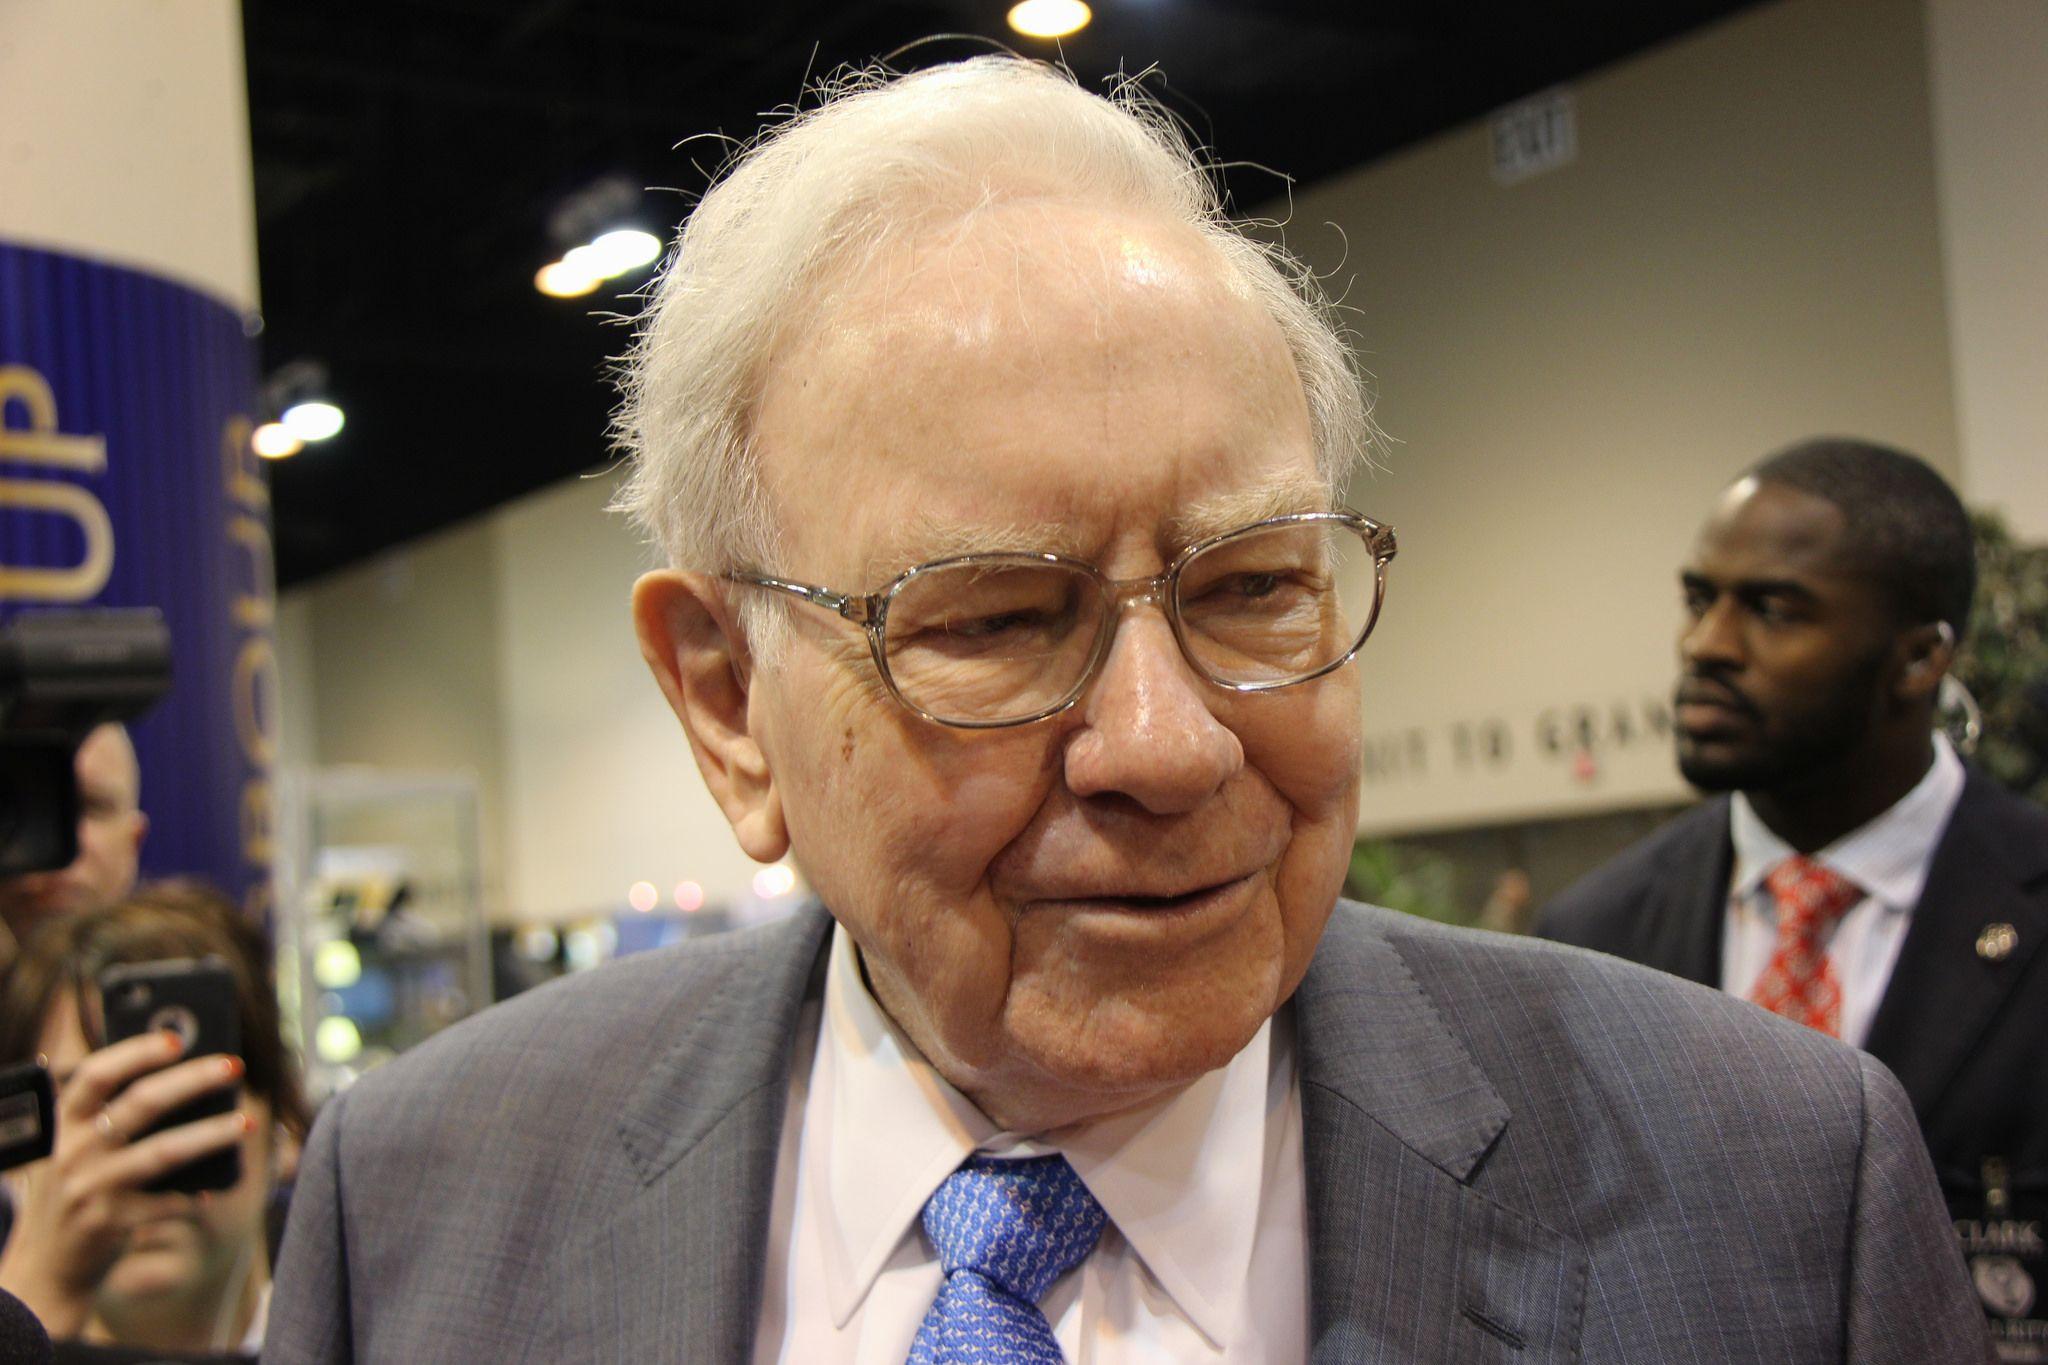 Warren Buffett speaking to the media at Berkshire Hathaway's annual meeting.